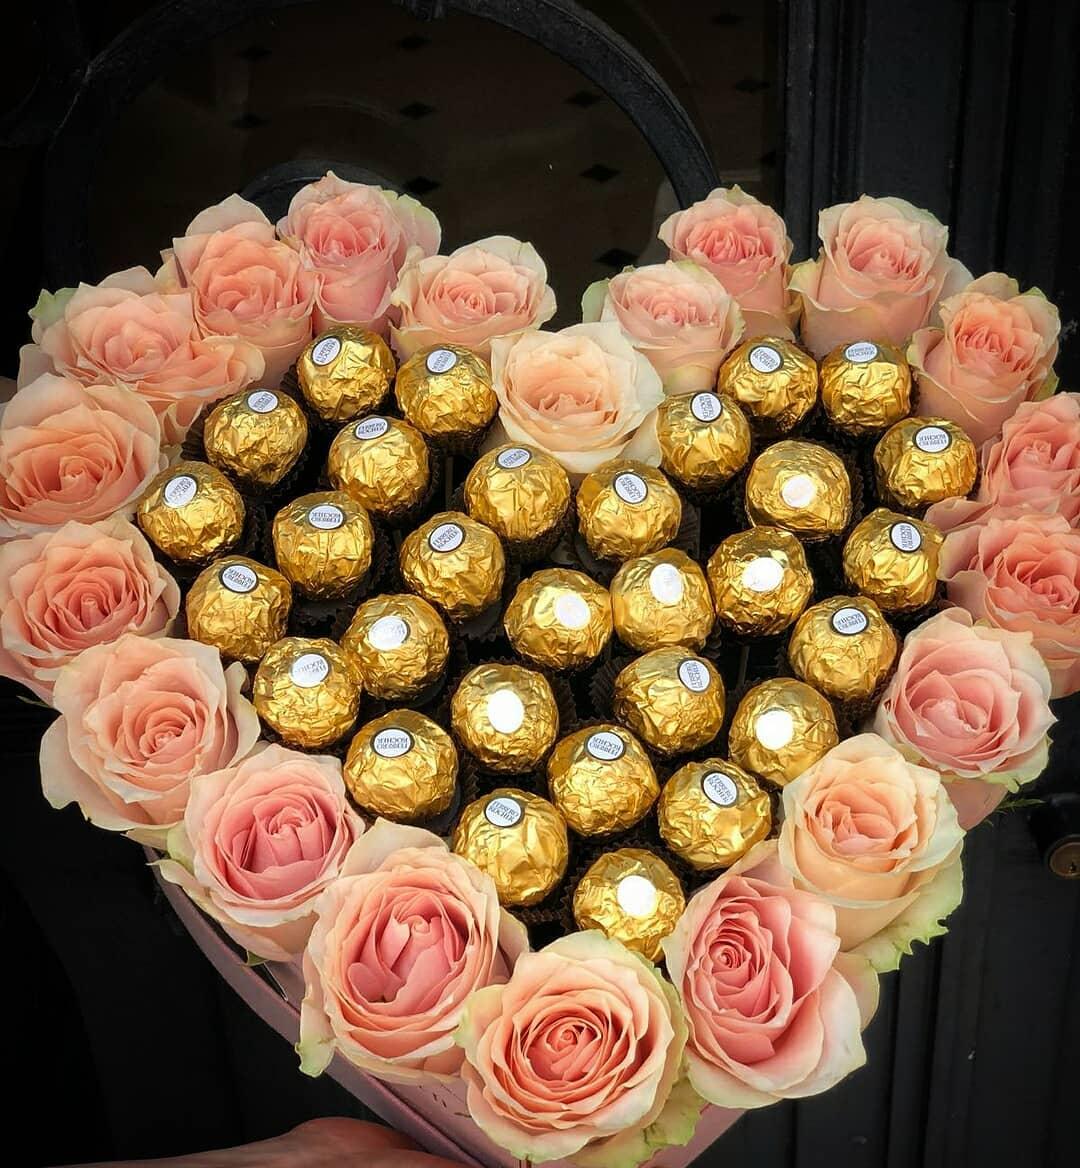 باکس گل و شکلات